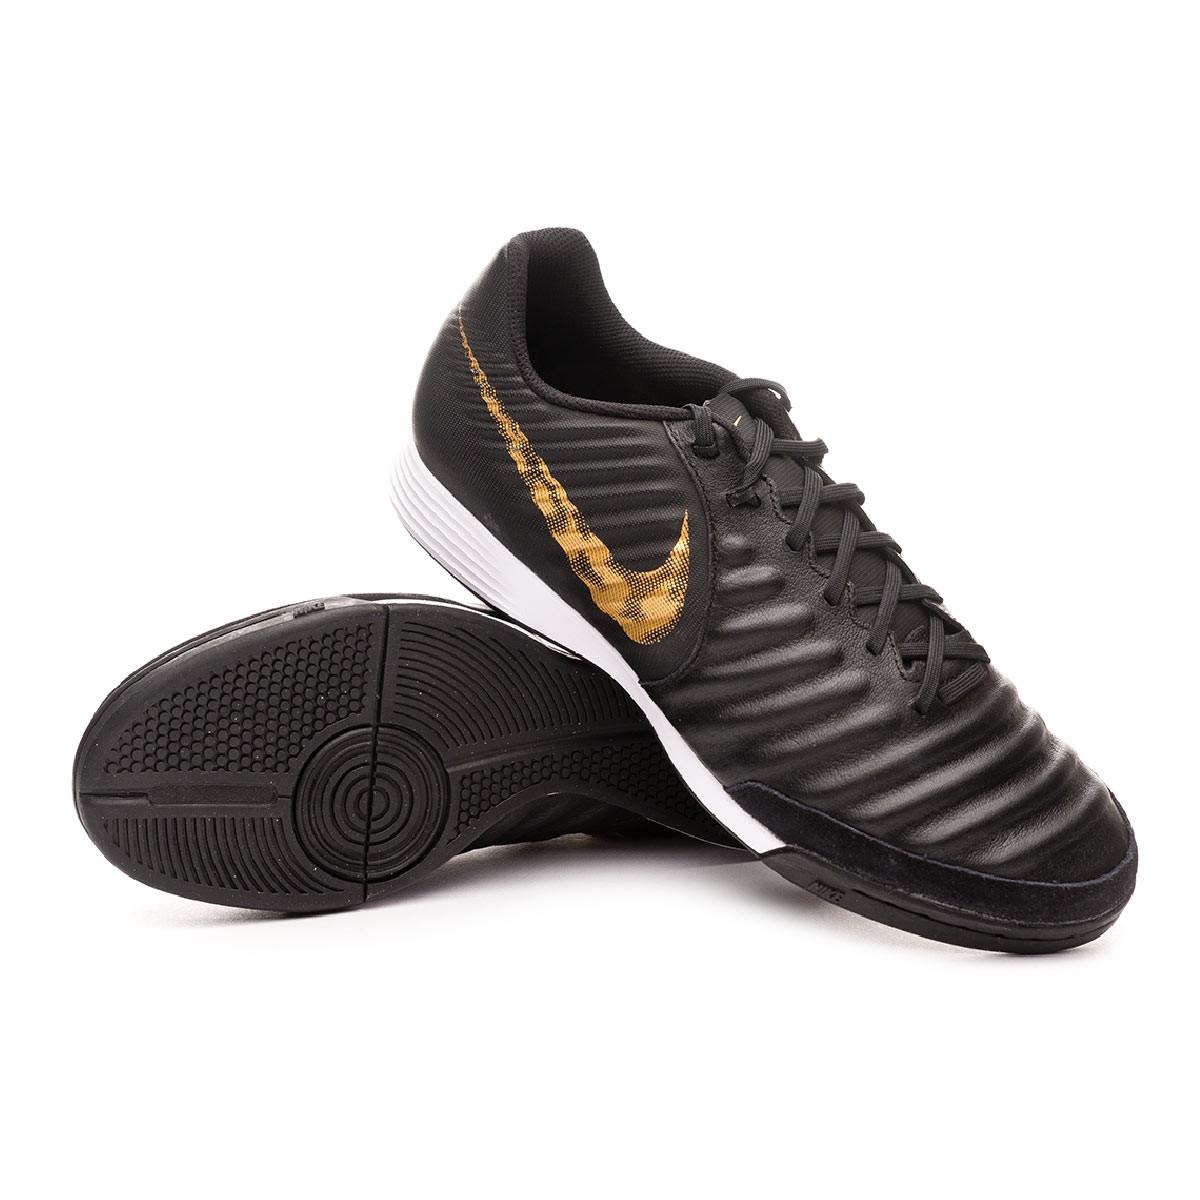 Posteridad Manifestación Paternal  Futsal Boot Nike Tiempo LegendX VII Academy IC Black-Metallic vivid gold -  Football store Fútbol Emotion